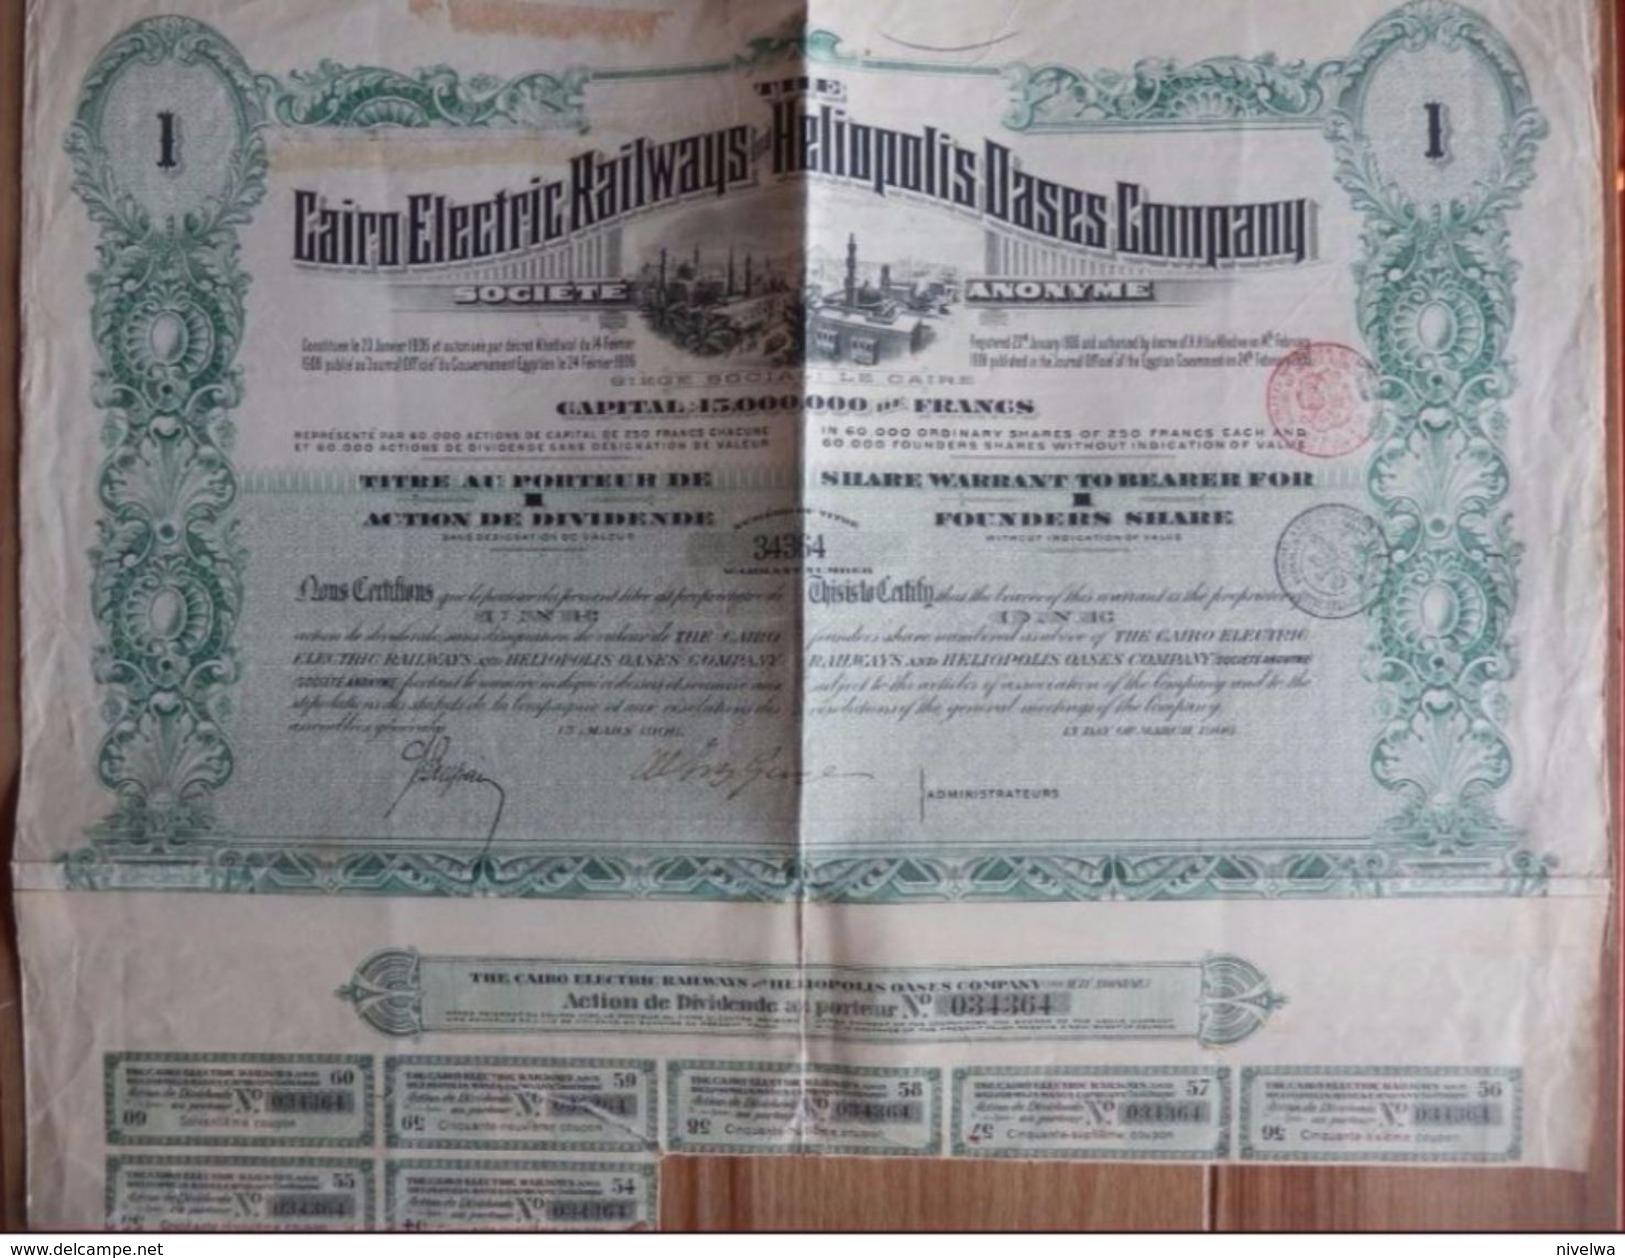 ACTION CAIRO ELECTRIC RAILWAYS 1906 + Papier Kredietbank Kortrijk (2 Scans) - 113 - Chemin De Fer & Tramway